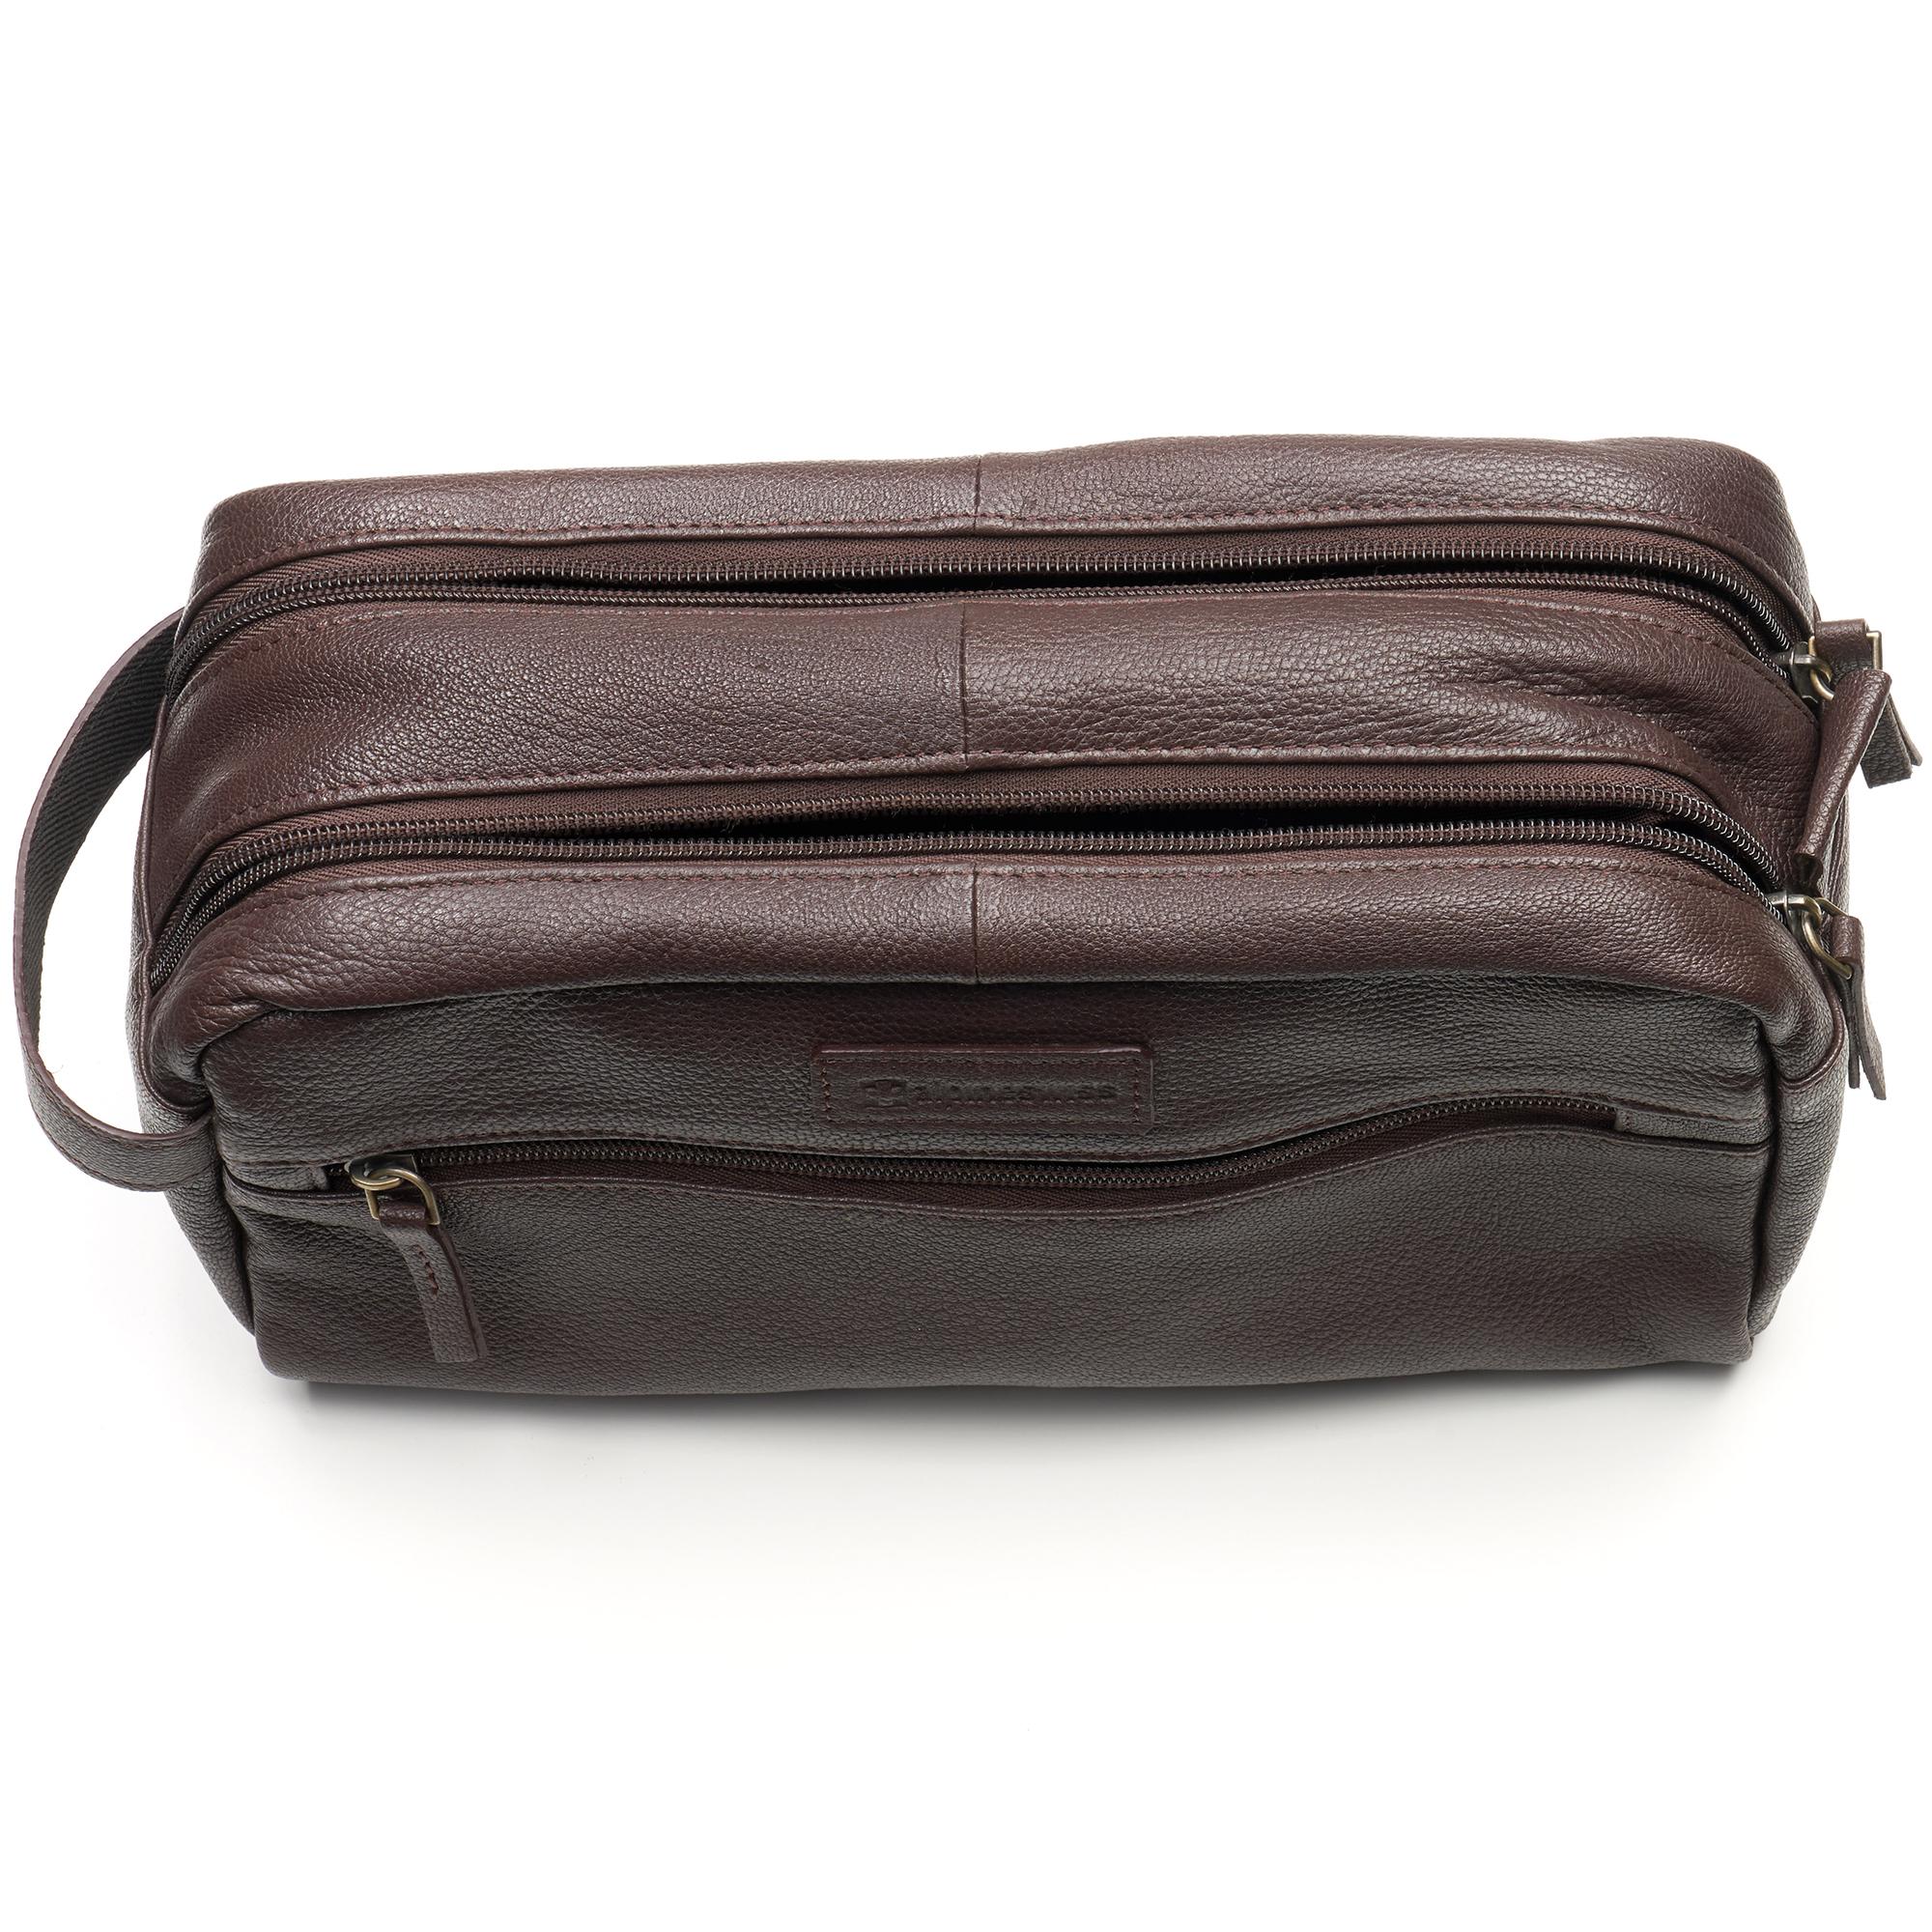 AlpineSwiss-Sedona-Toiletry-Bag-Genuine-Leather-Shaving-Kit-Dopp-Kit-Travel-Case thumbnail 24